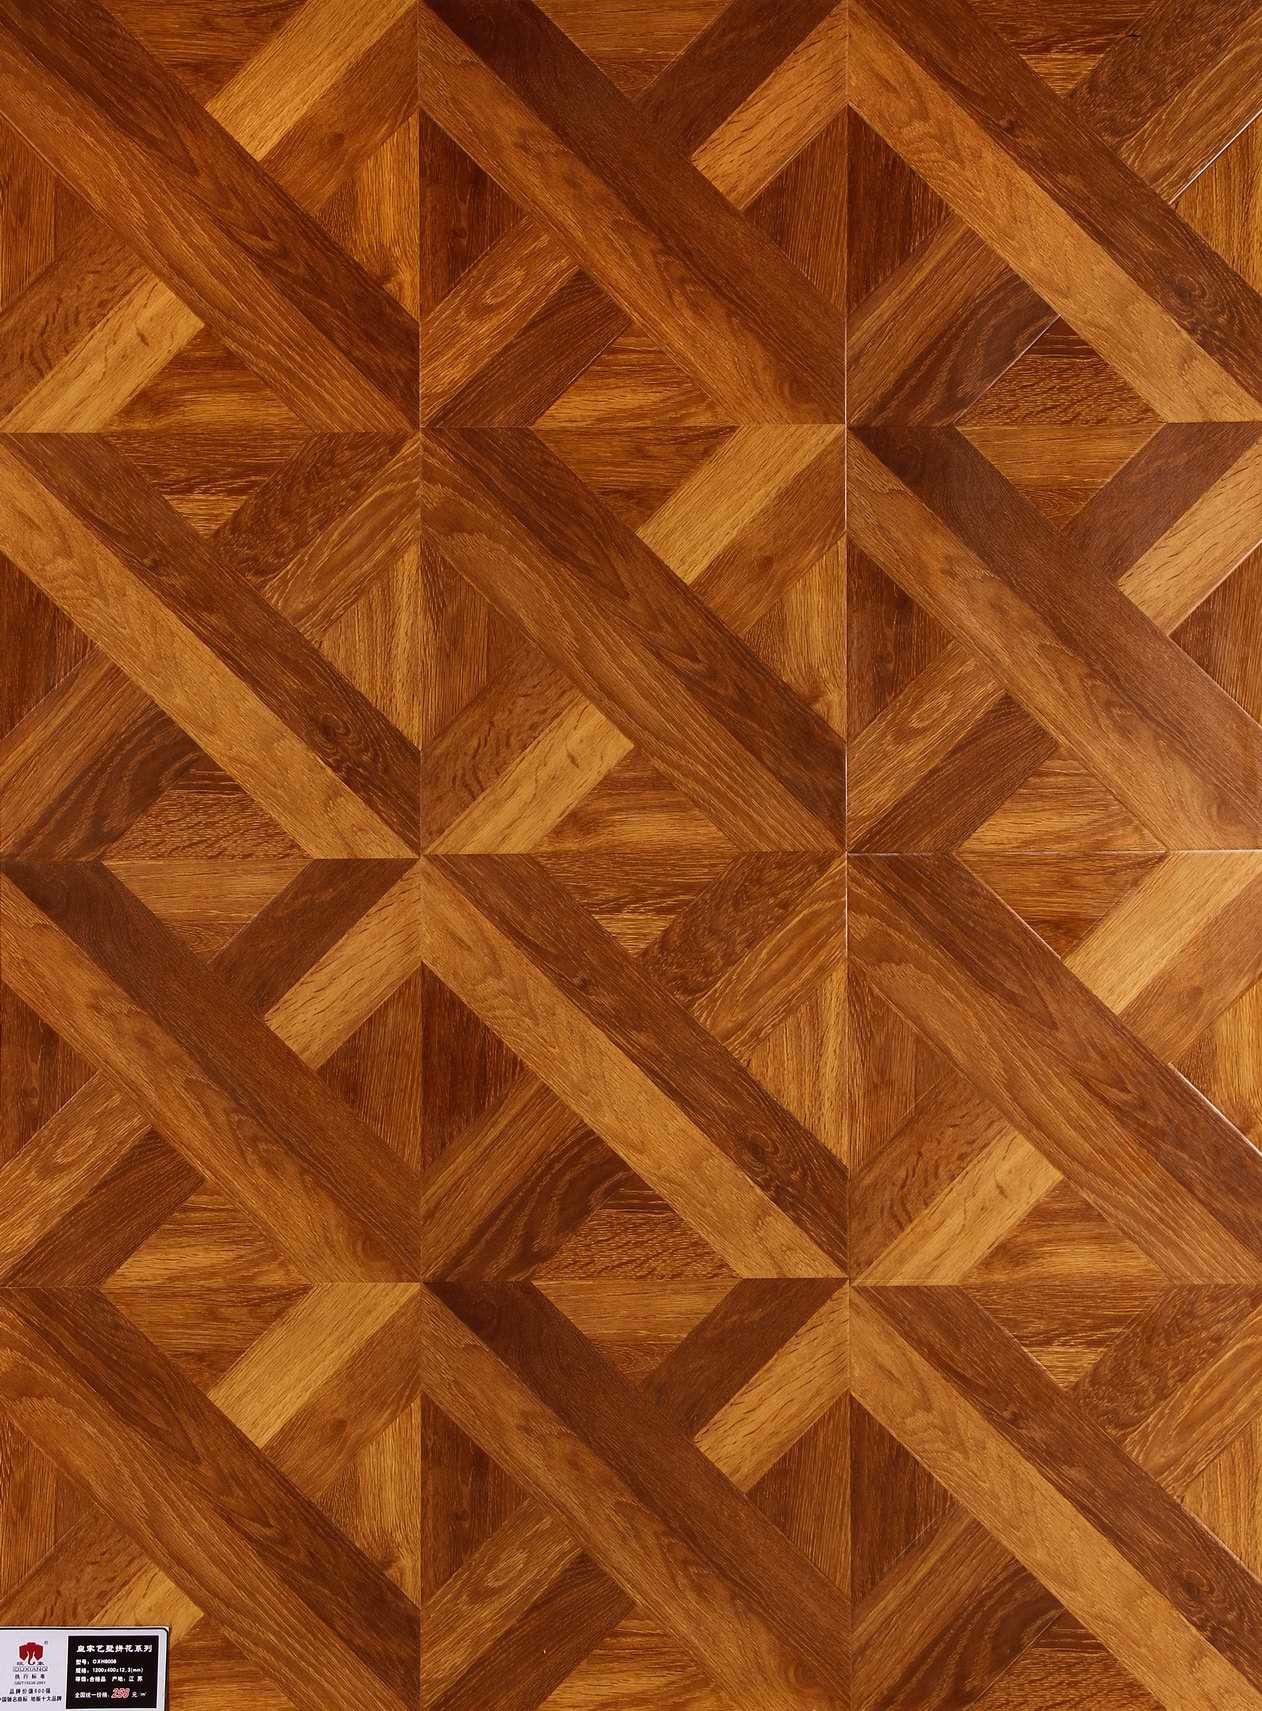 China Parquet Flooring (OXH8006) - large image for Parquet